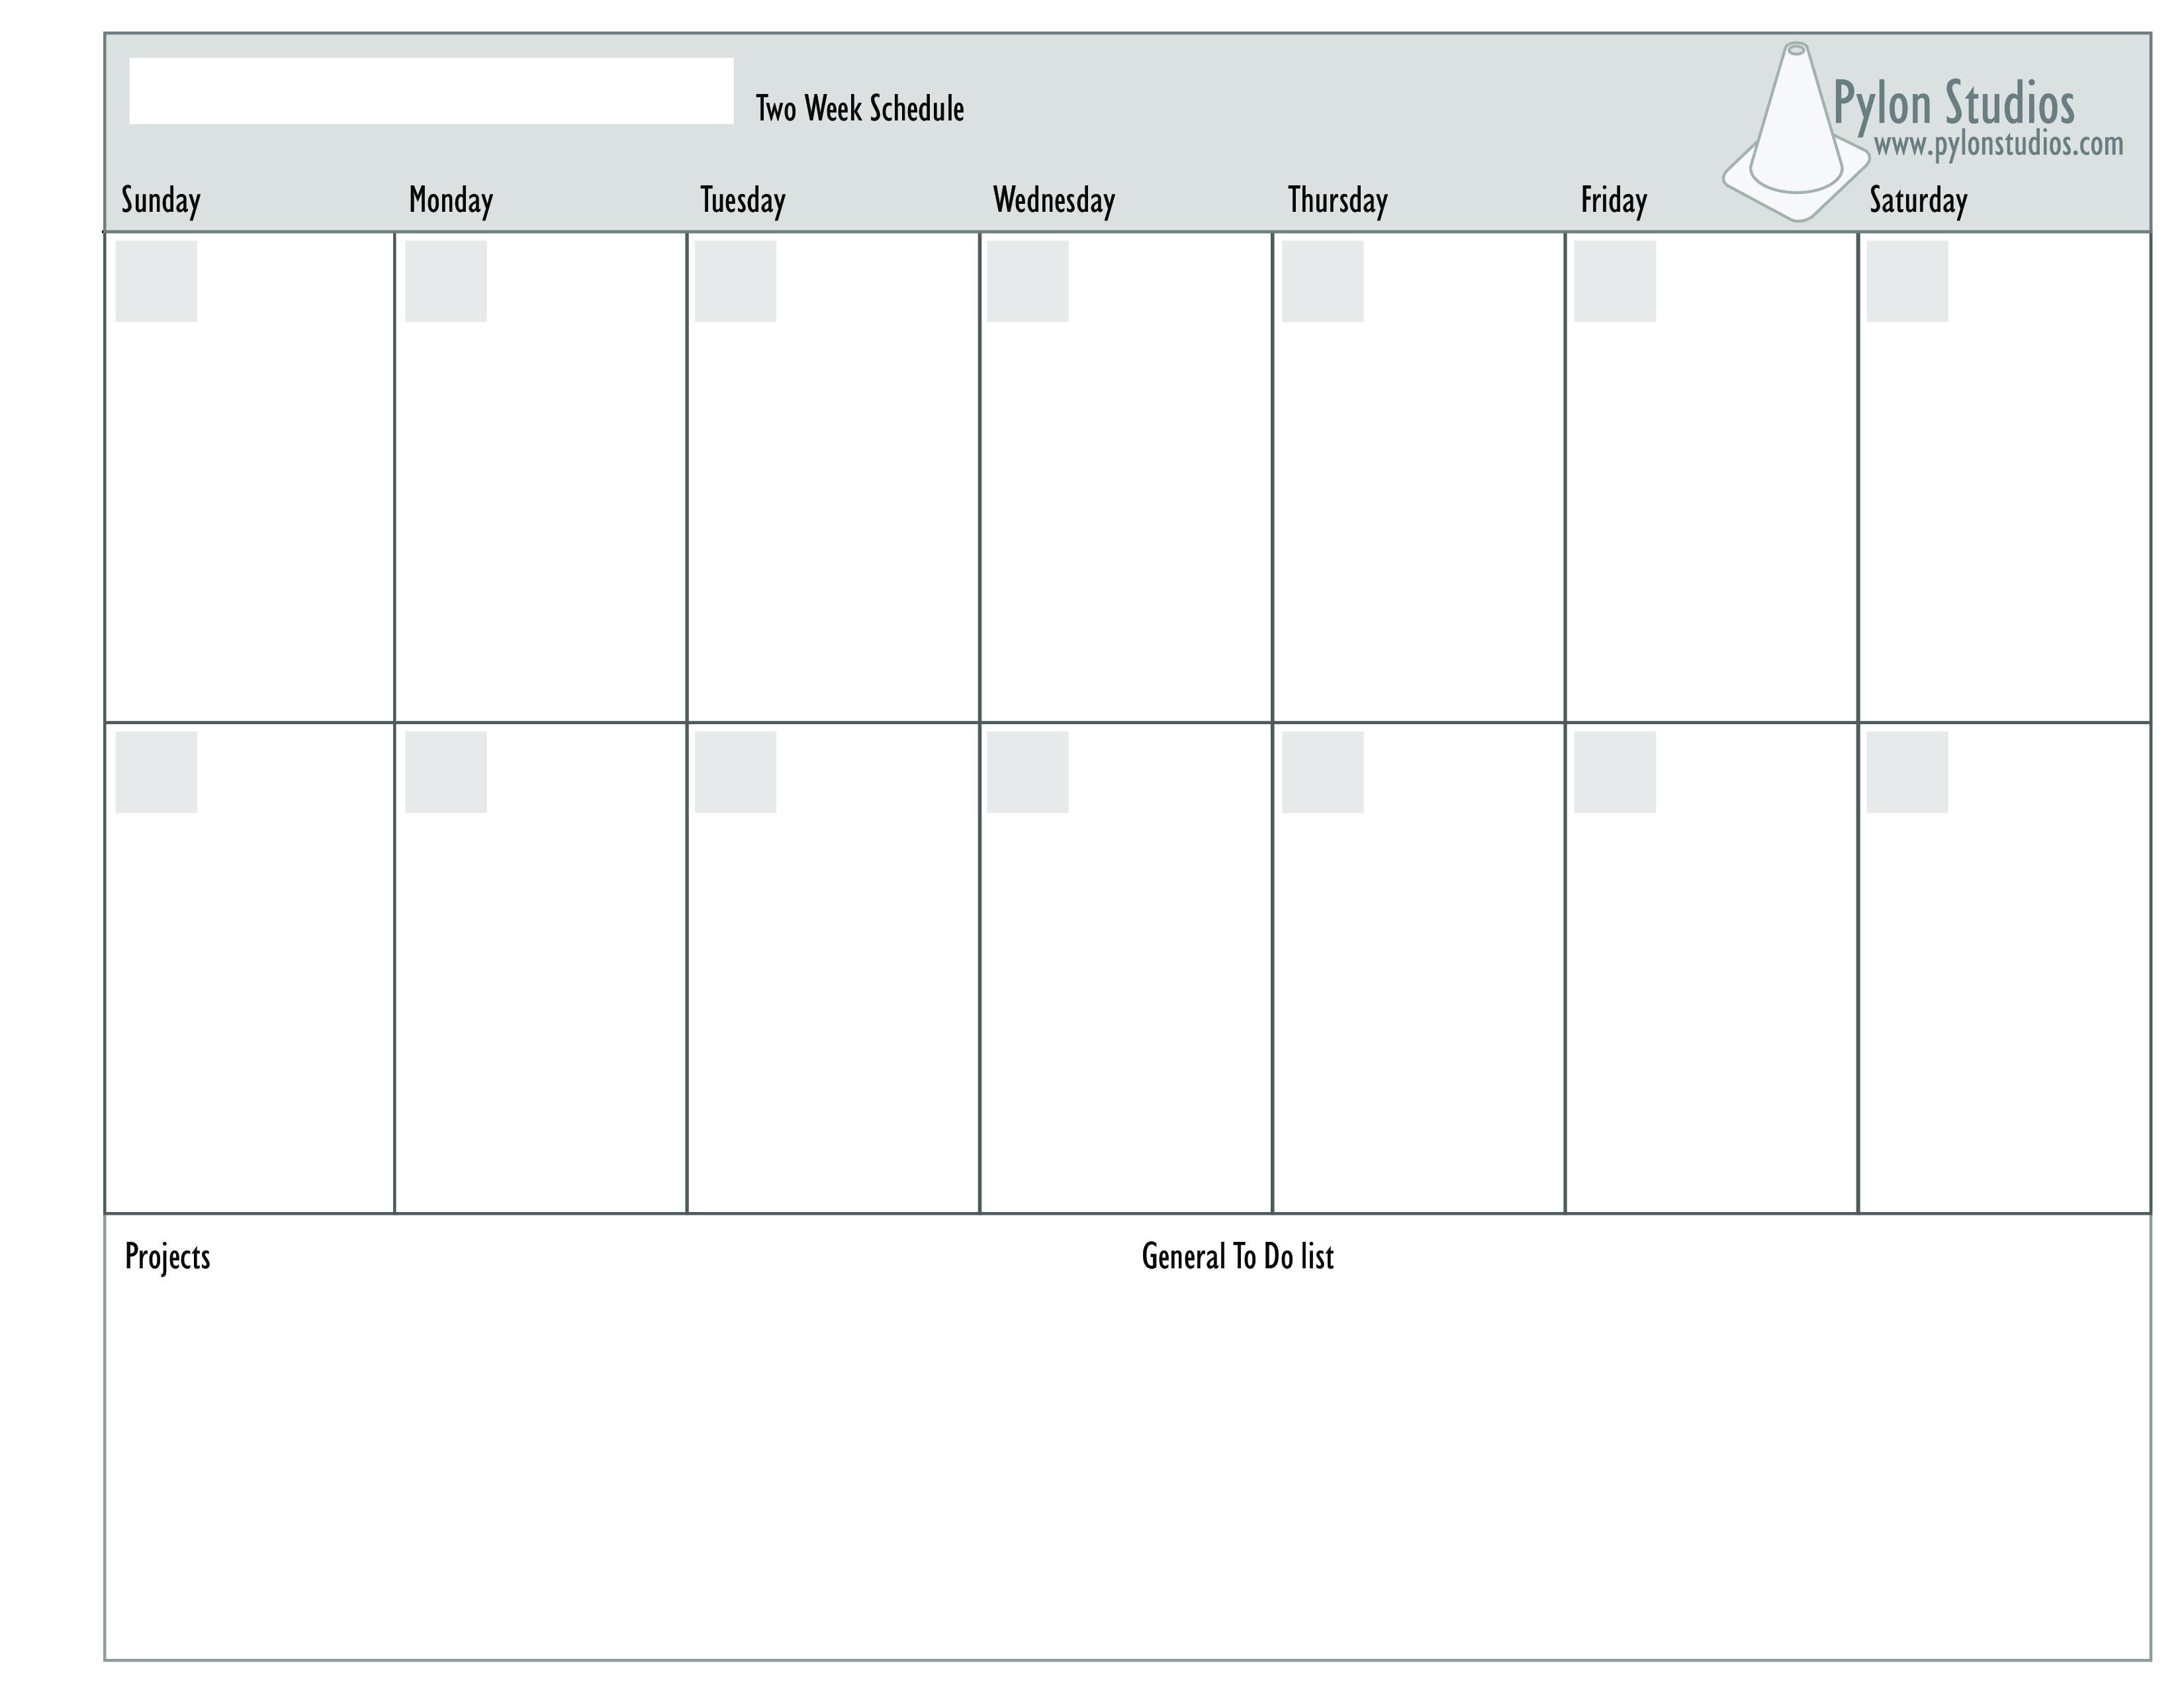 2 Week Calendar - How To Create A 2 Week Calendar? Download How To A Make A Two Week Schedule